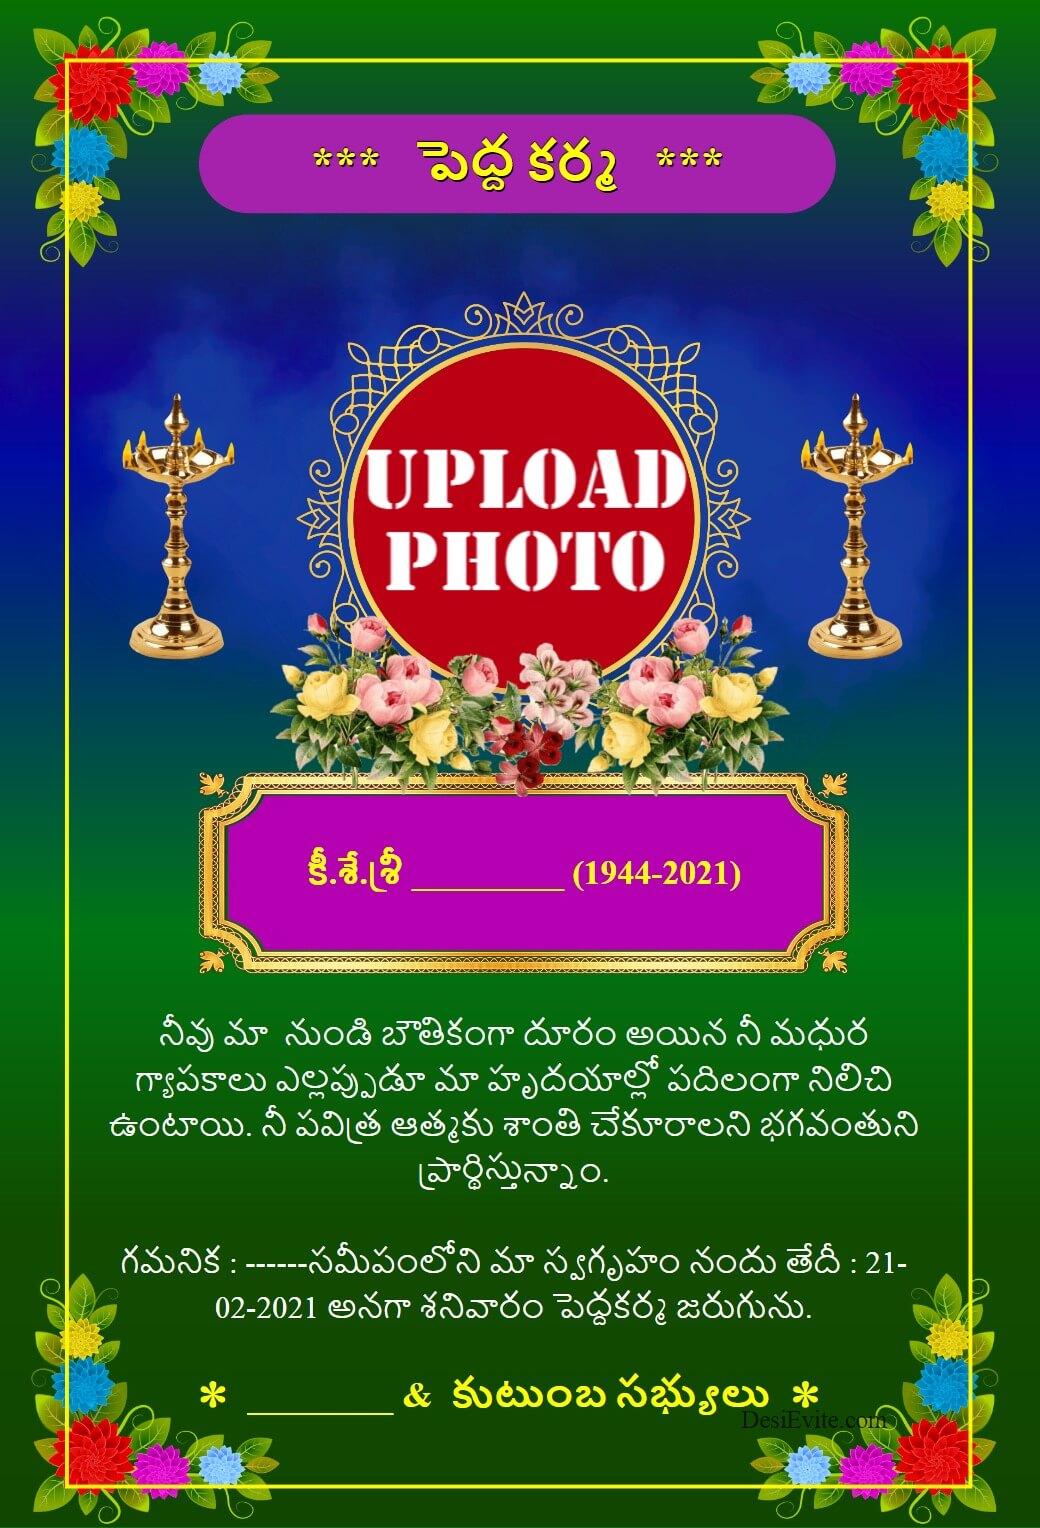 Pedda karma kriyalu card in telugu